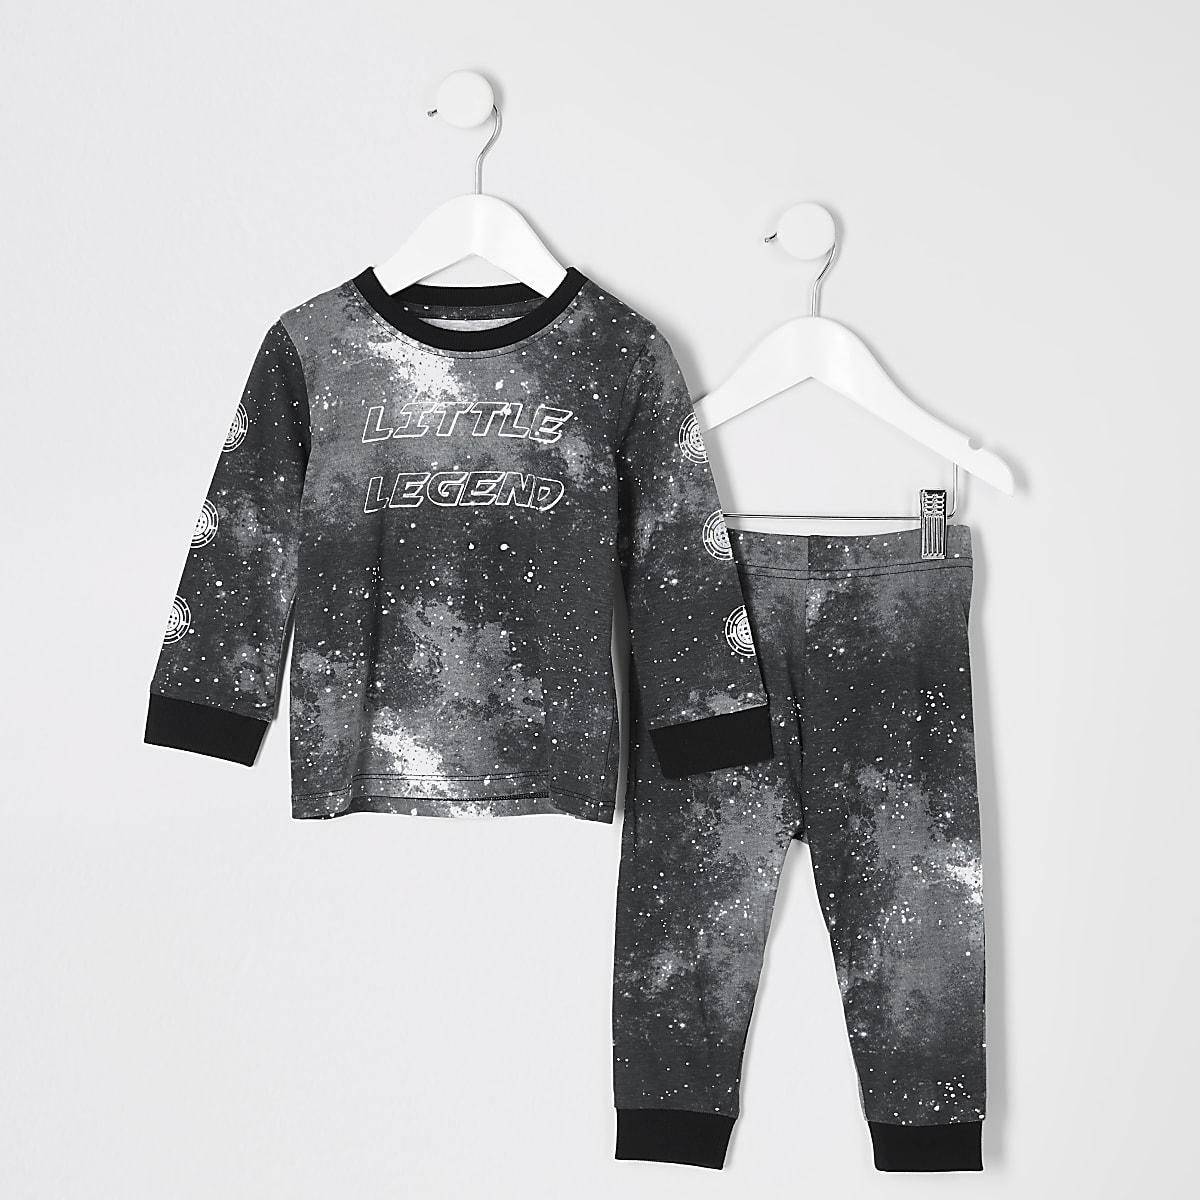 Mini boys black galactic print pyjama outfit